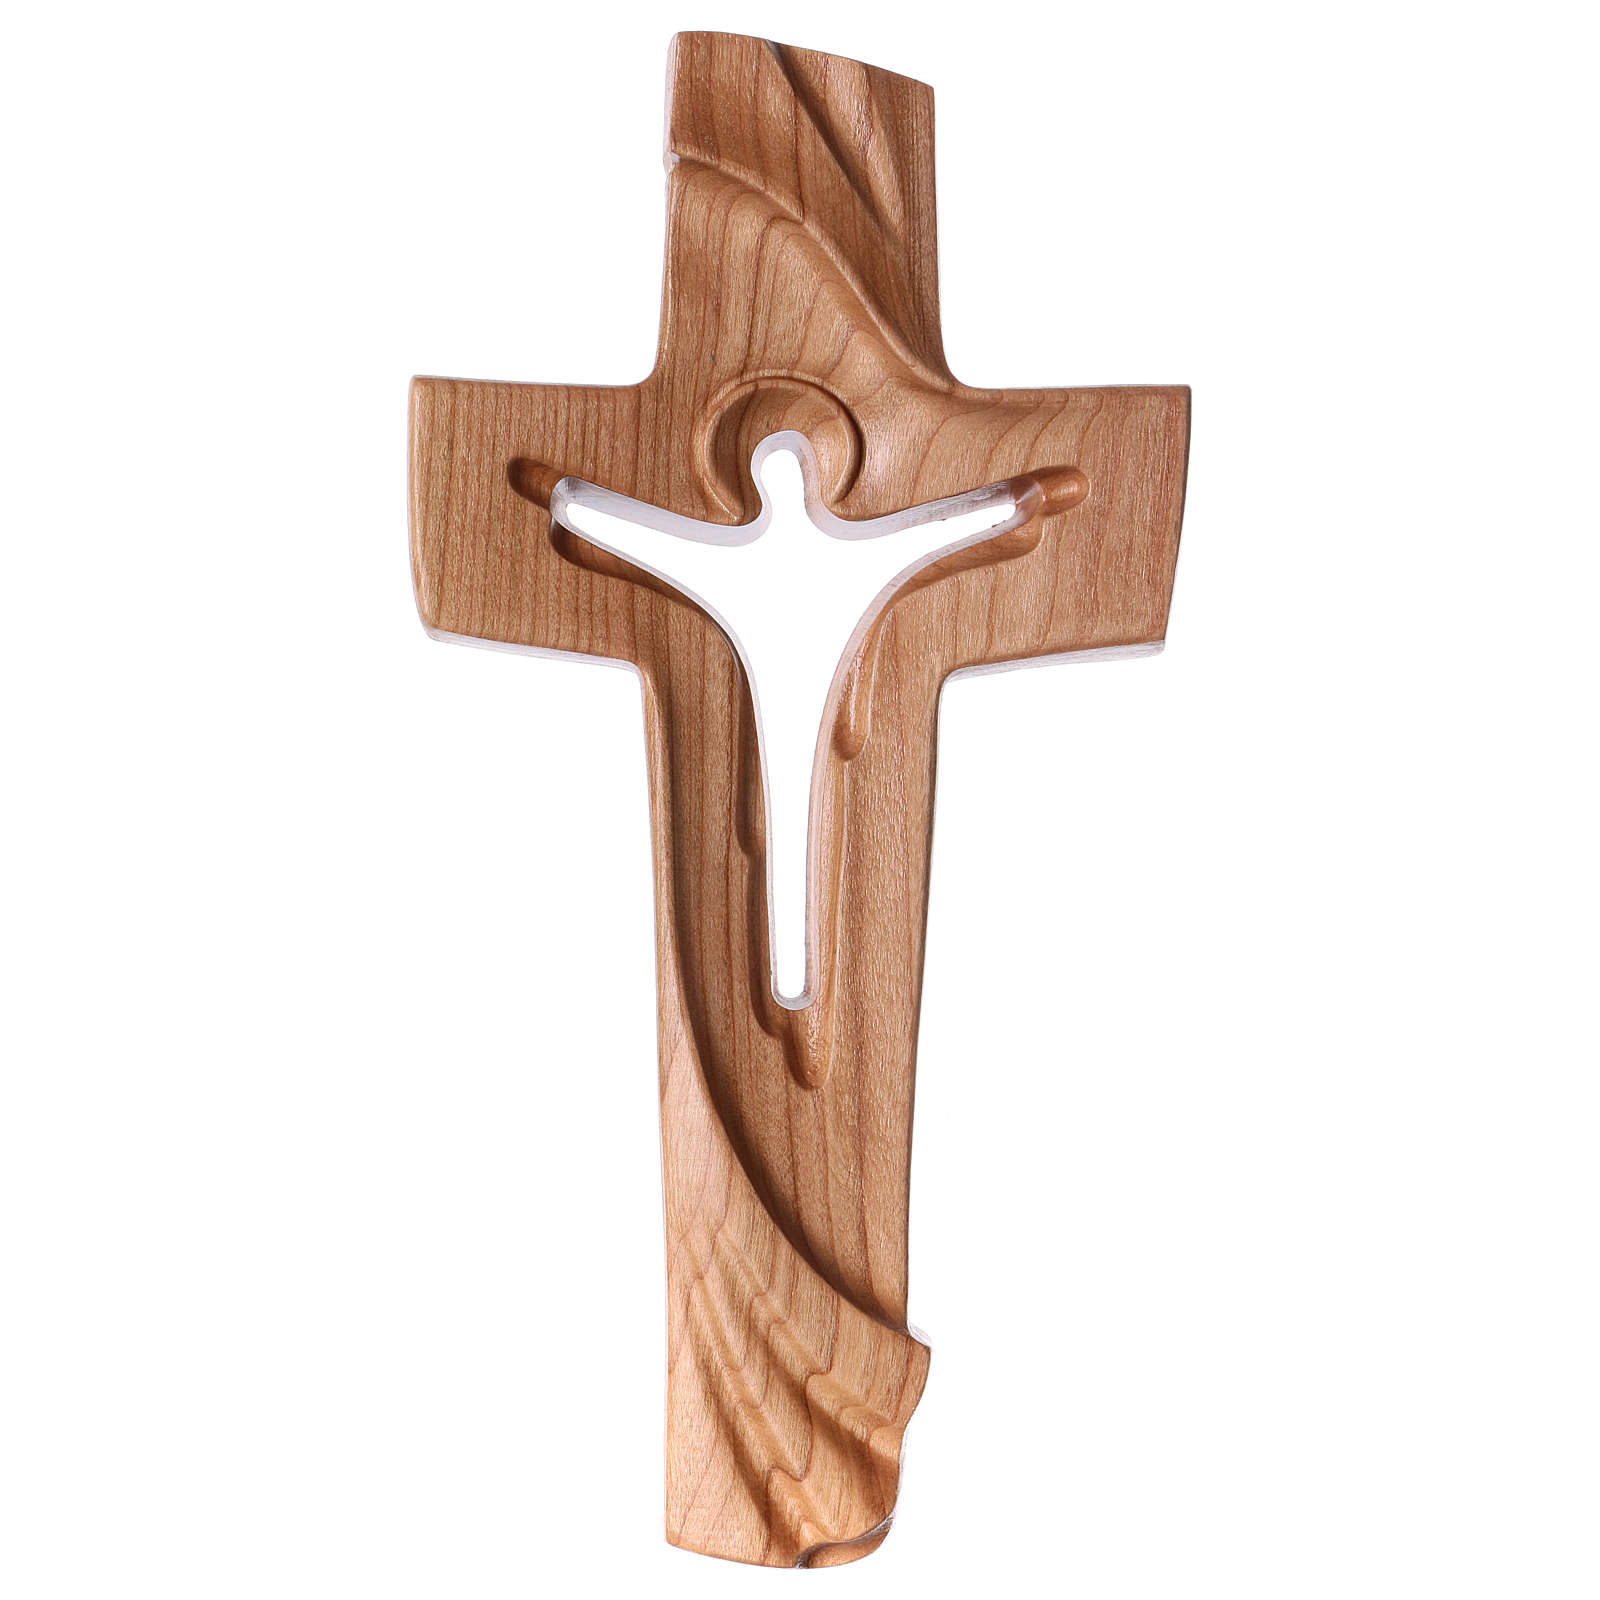 Croce della Pace Ambiente Design legno ciliegio Valgardena satinato 4